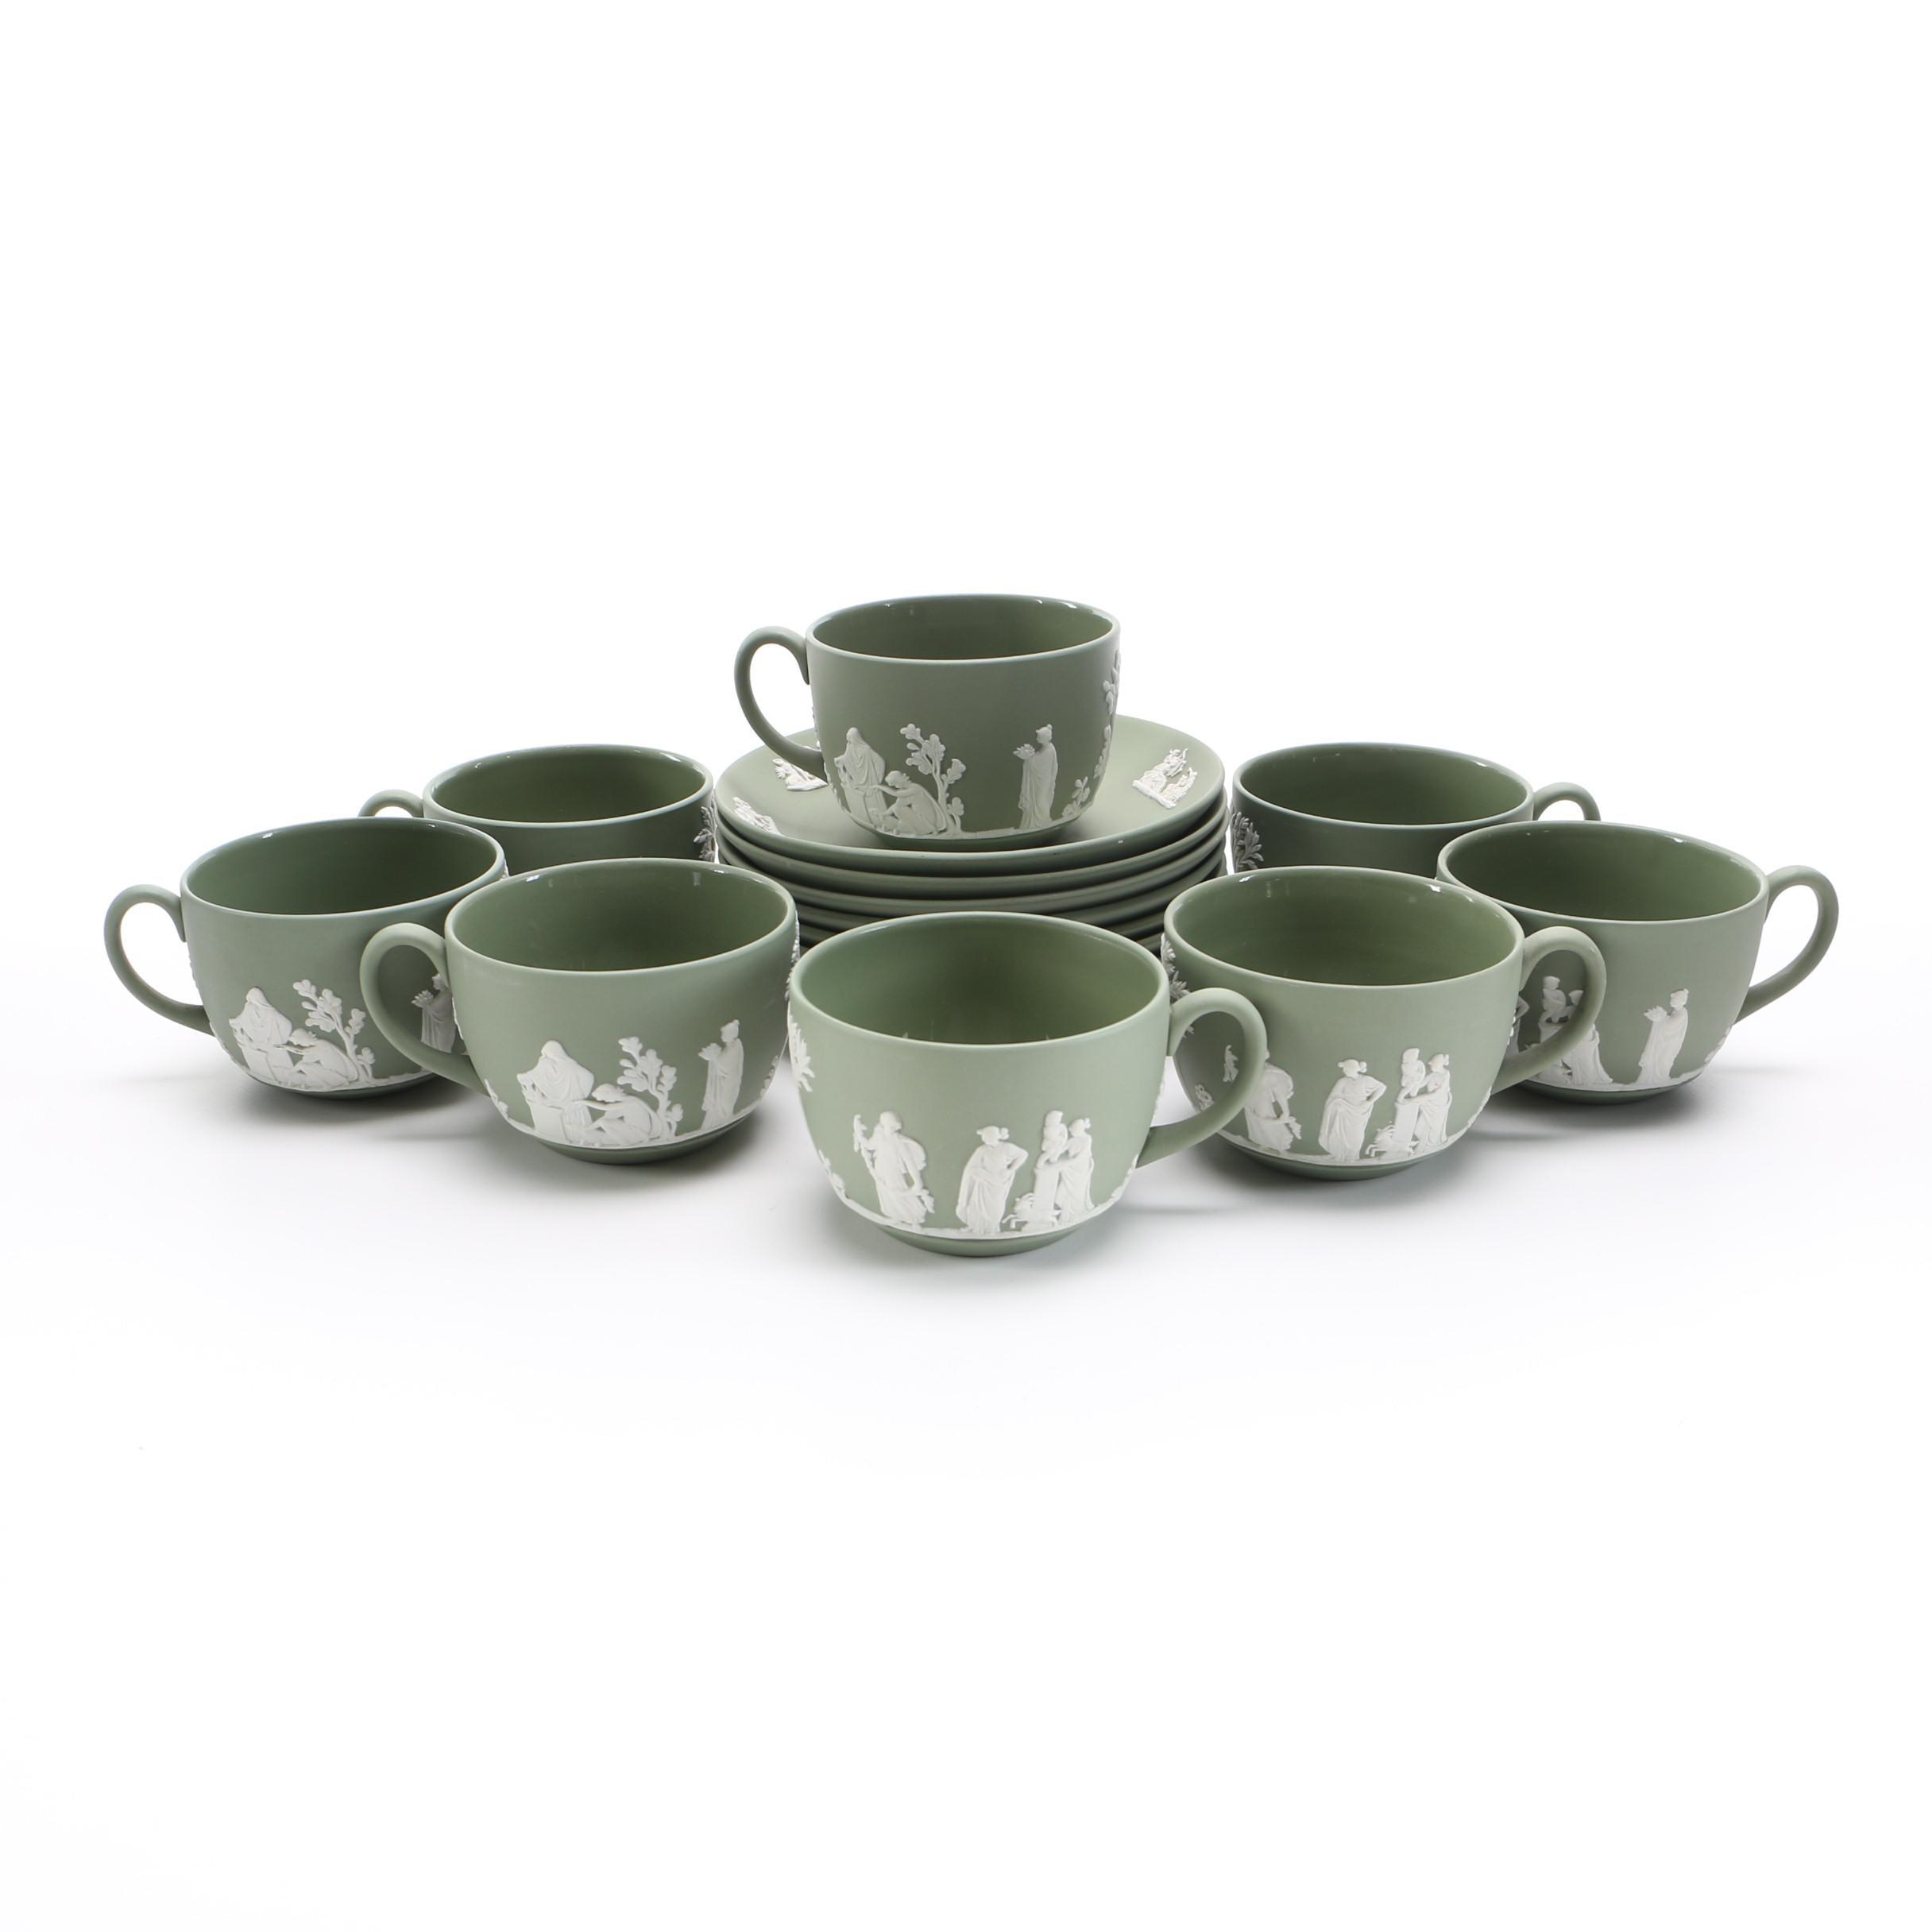 Wedgwood Green Jasperware Tea Set